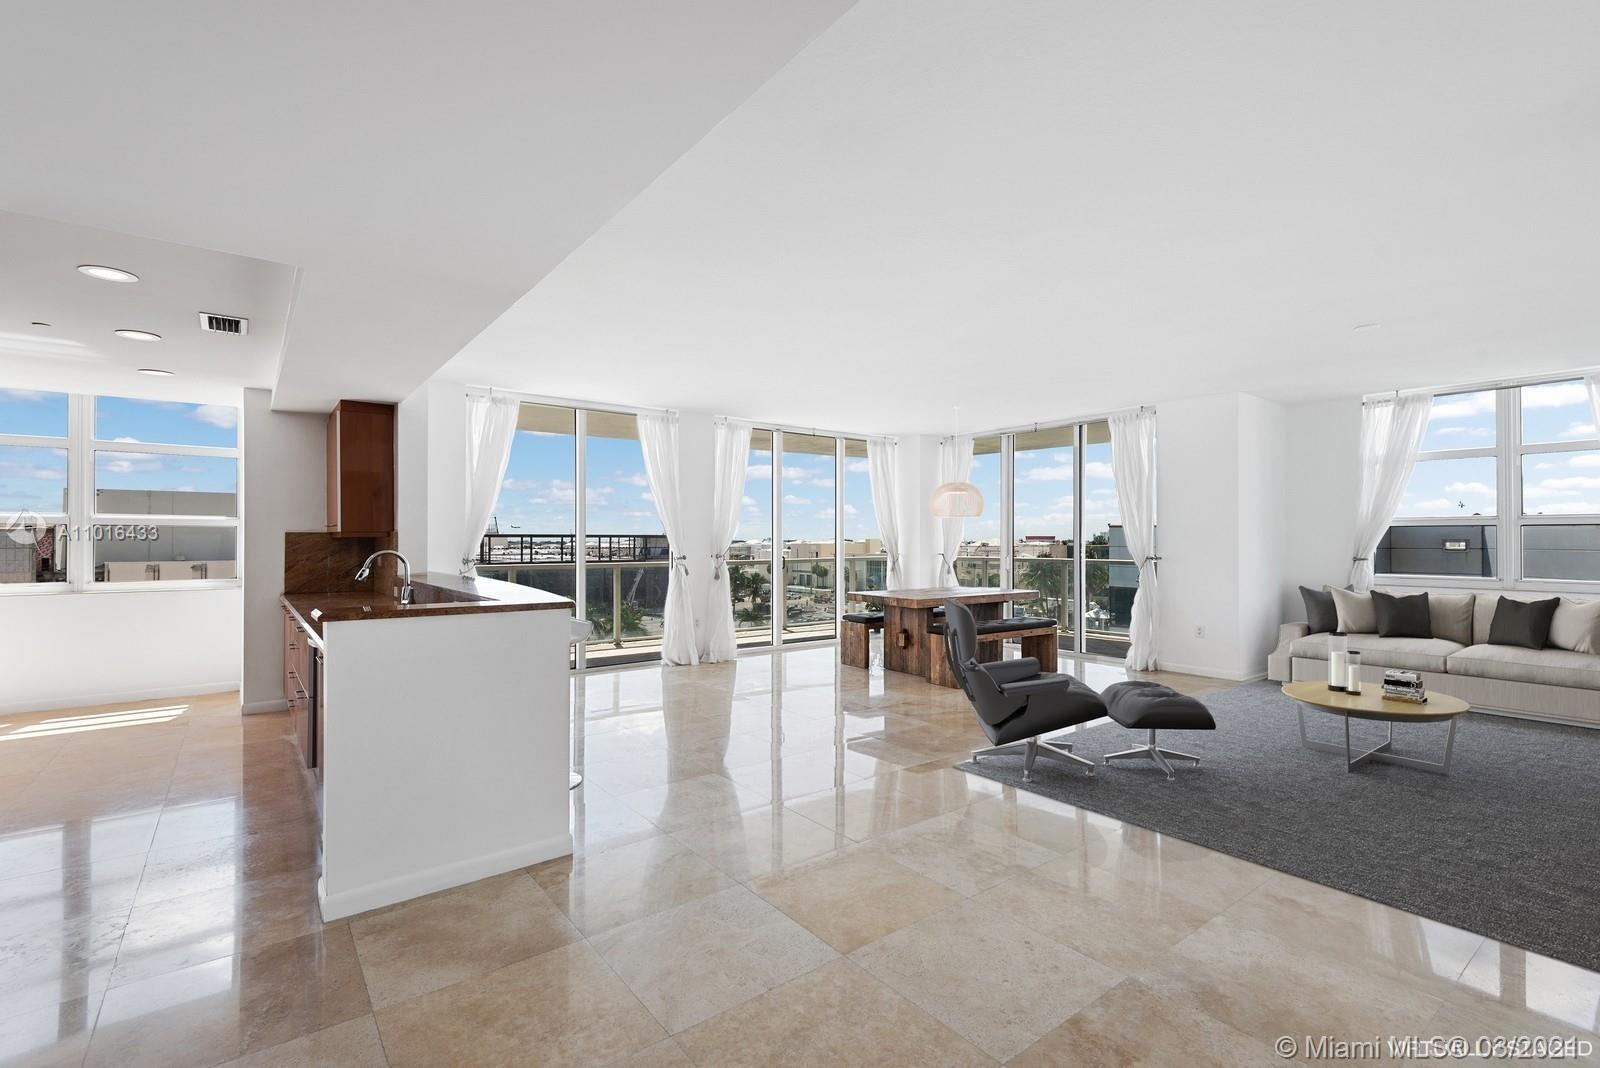 Luxury Yachting Community Lifestyle! Radiant & spacious masterfully designed corner floor-plan with